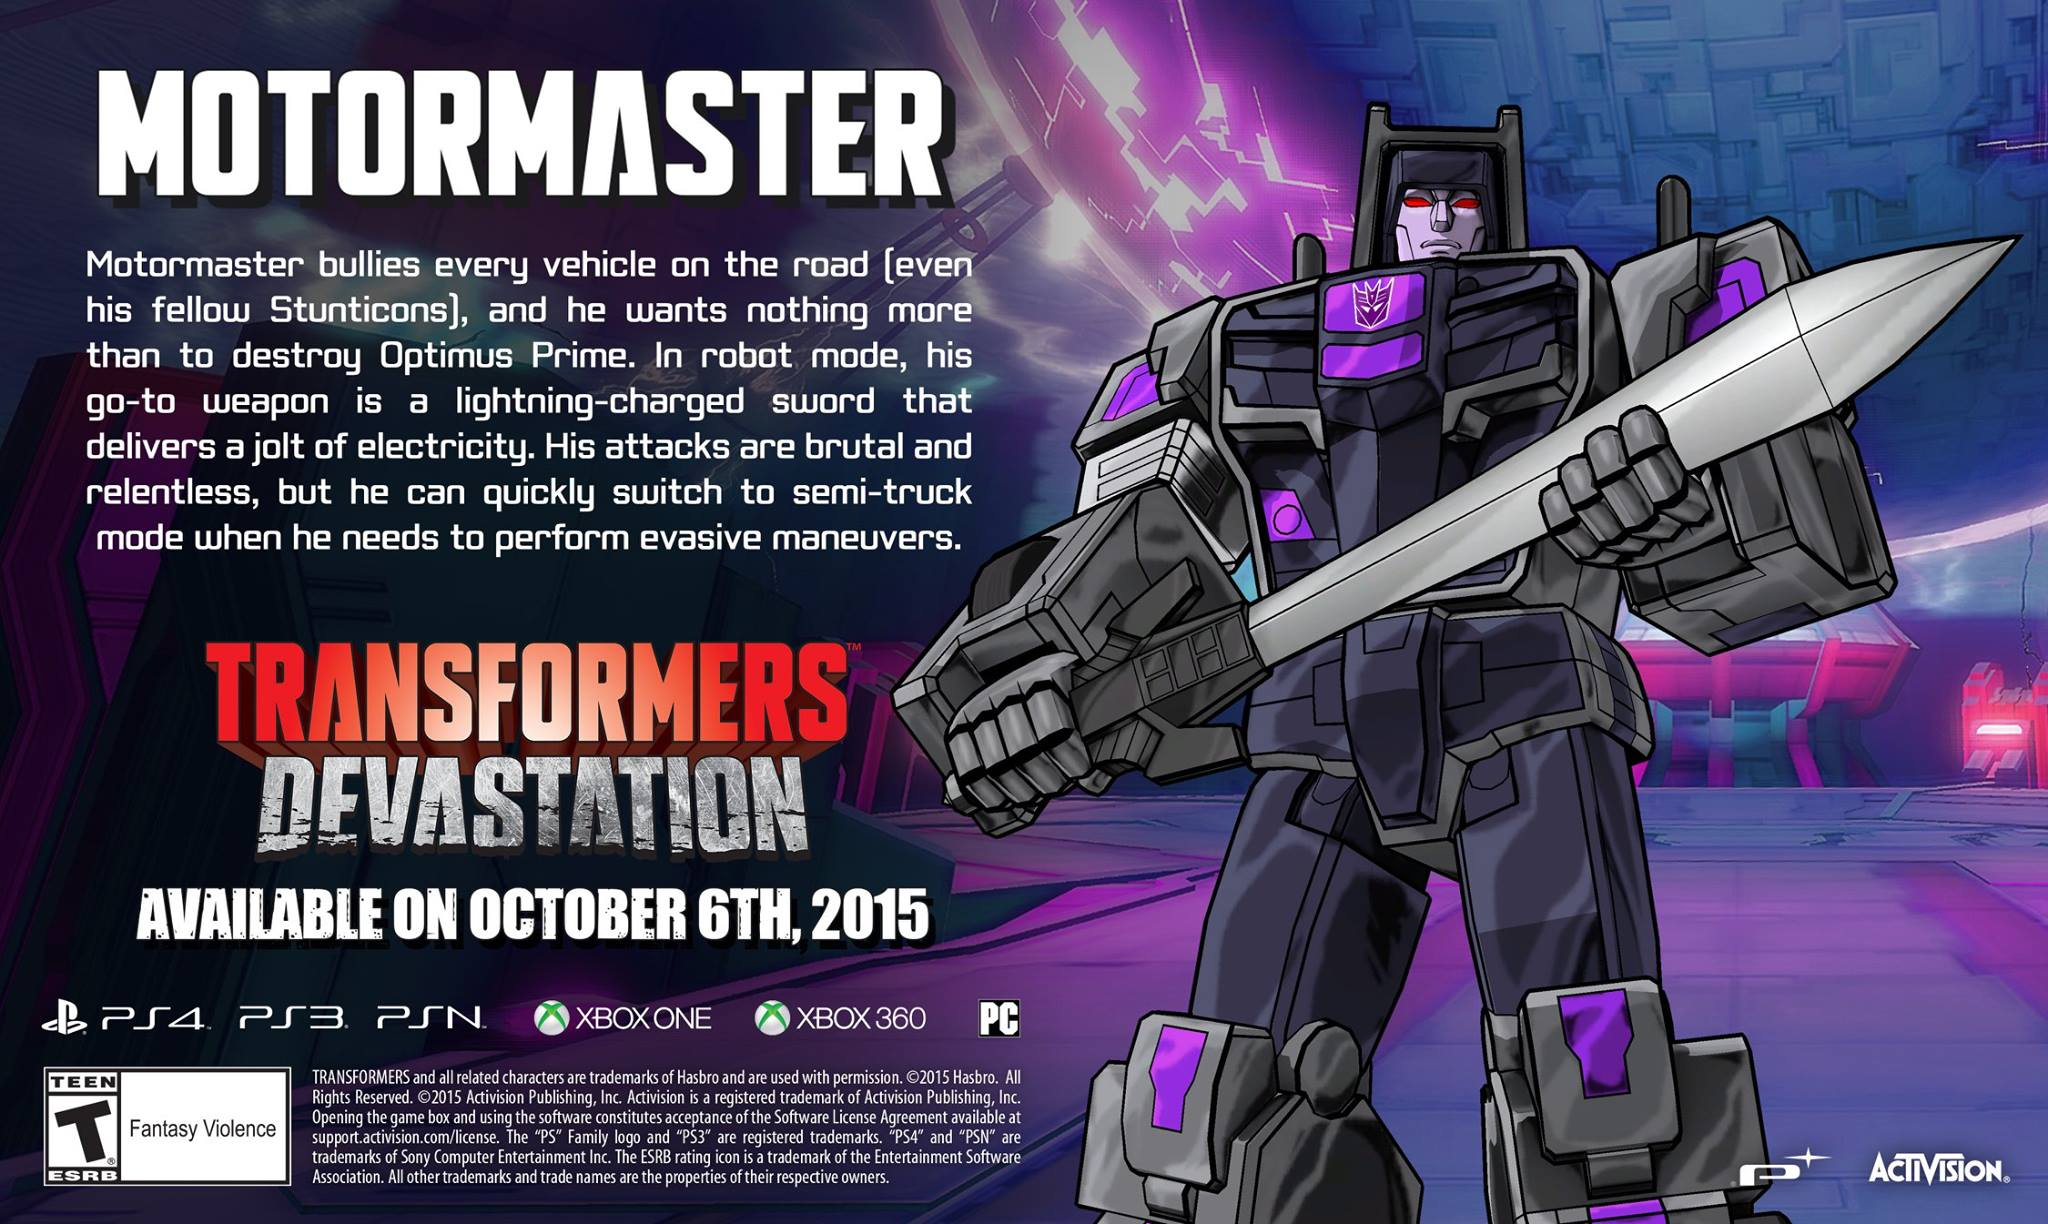 Grimlock Fall Of Cybertron Wallpaper Transformers Devastation Character Bio Update Motormaster